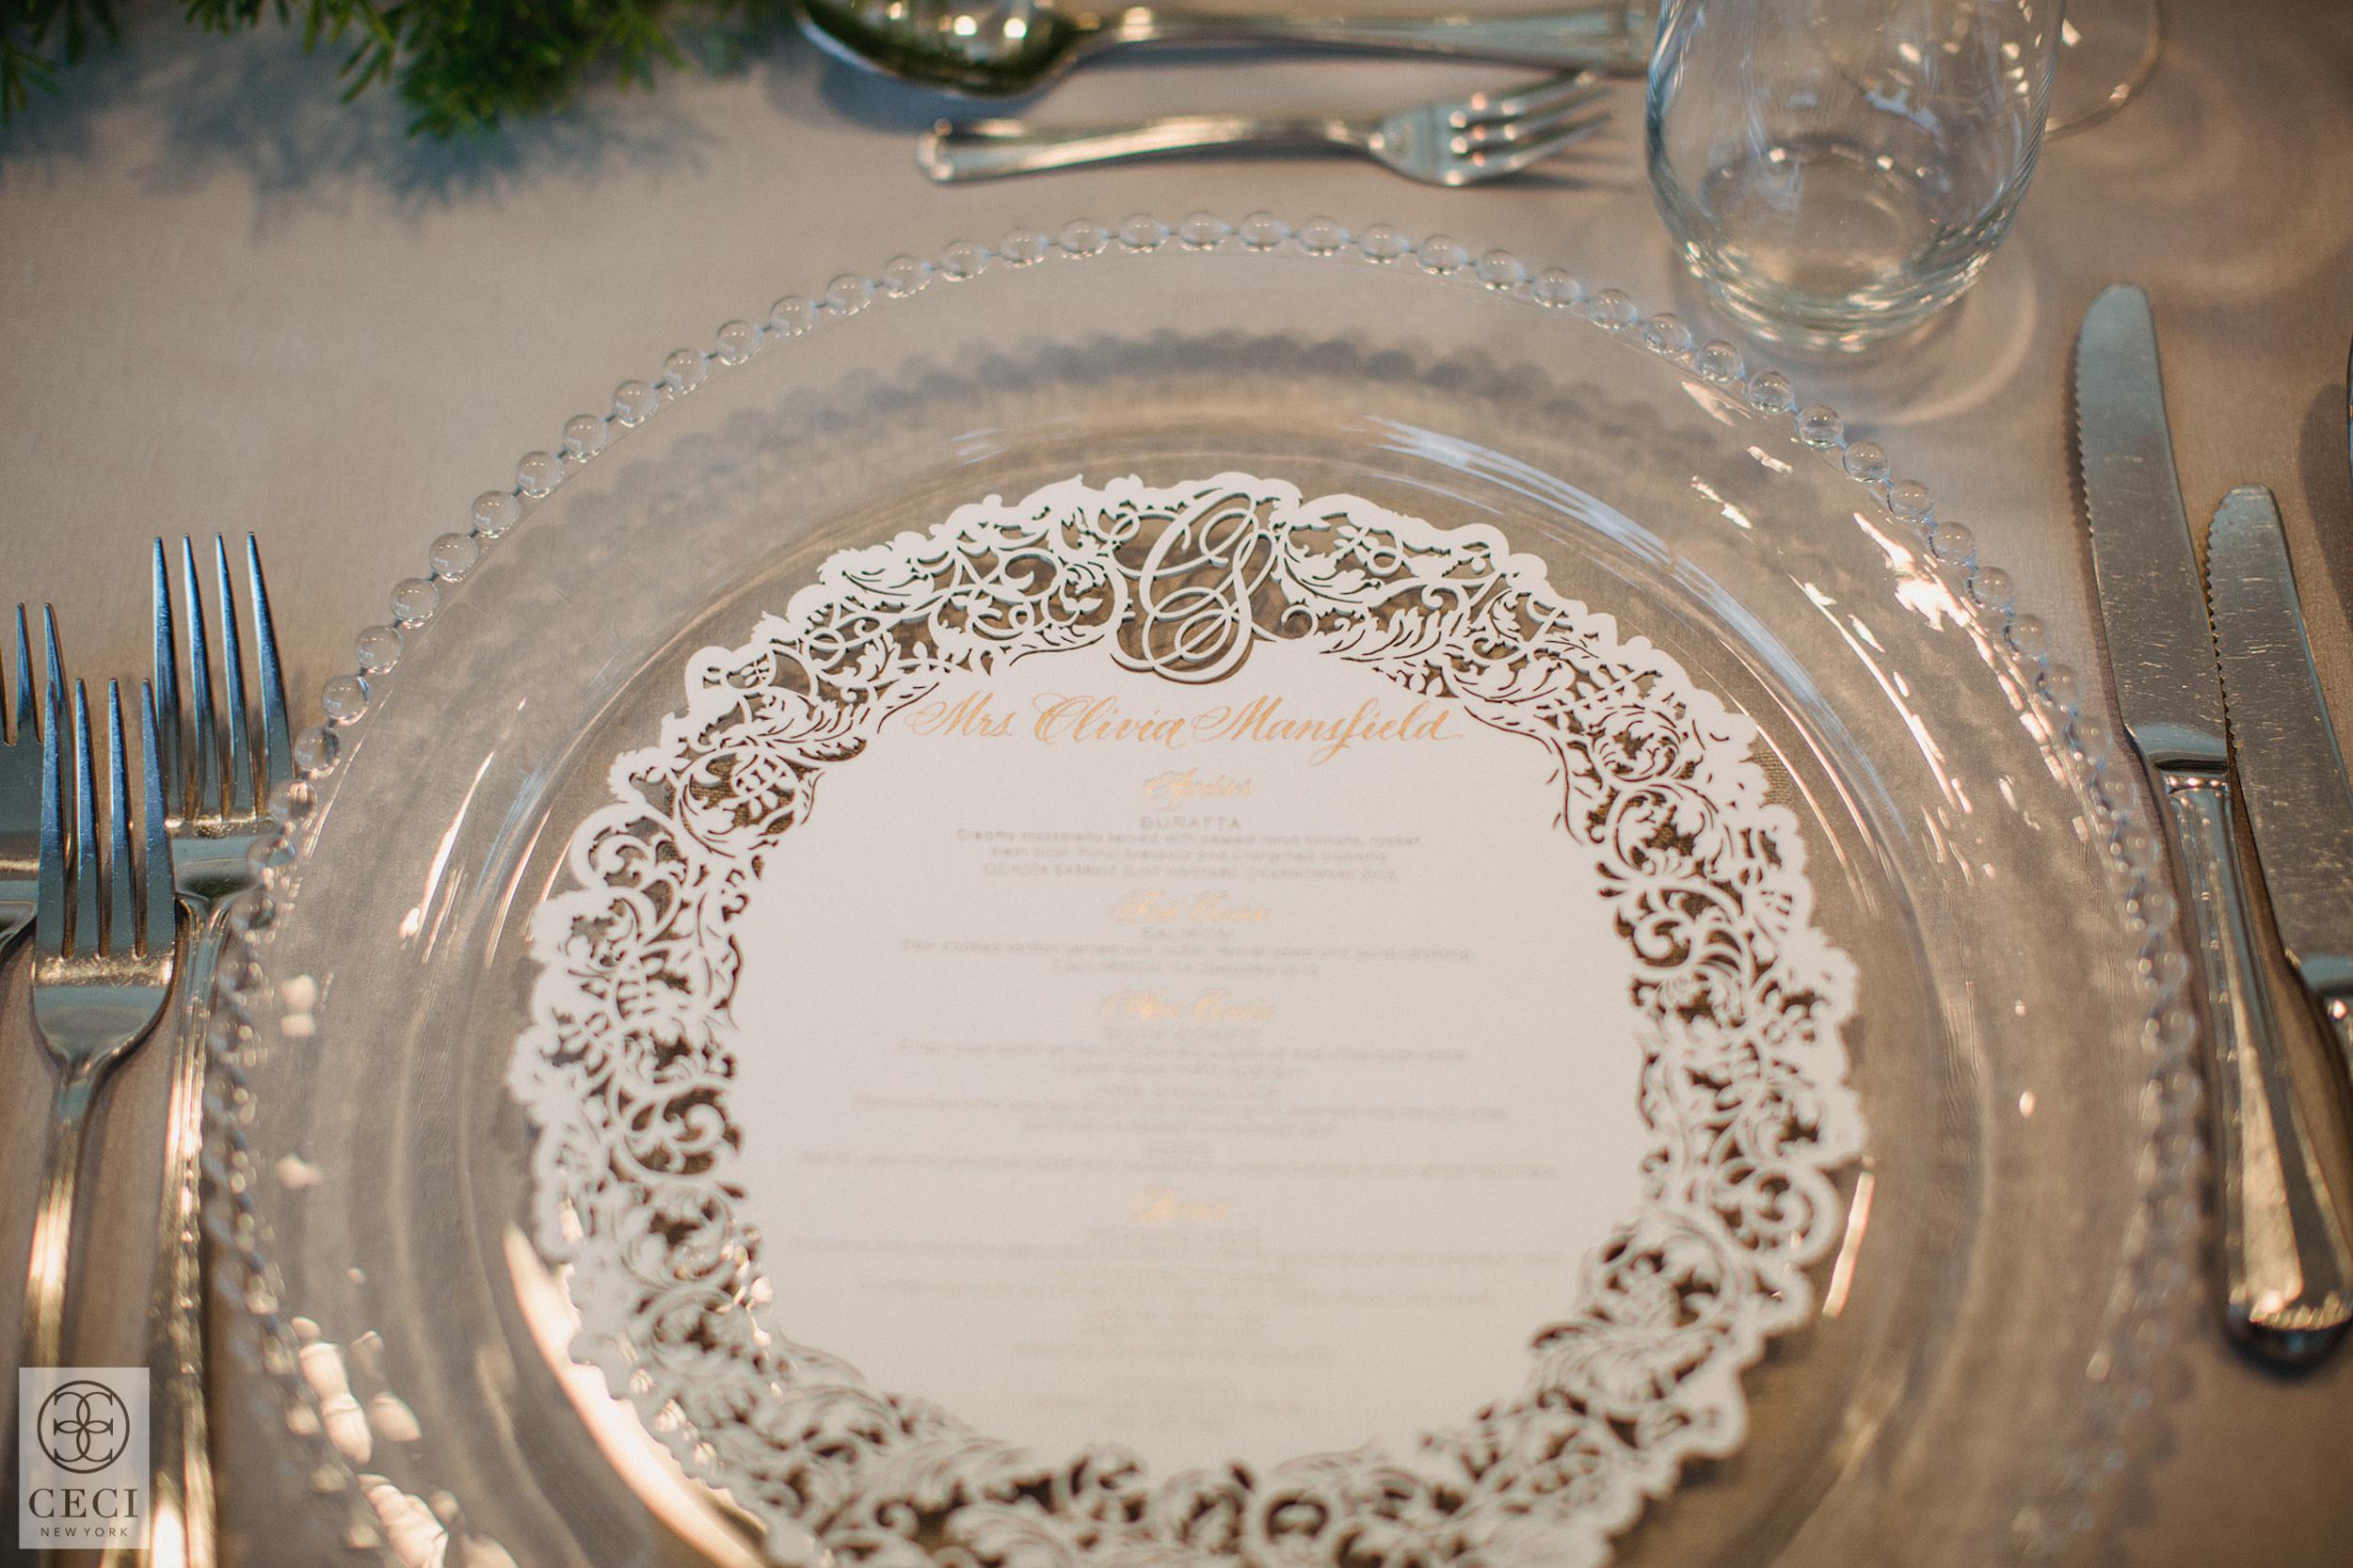 Ceci_New_York_Custom_Luxury_Wedding_BeautyShot_LaserCut_Stationery_Personalized_Couture_Foil_Stamping_Perth_Destination_Australia_Chic_-19.jpg